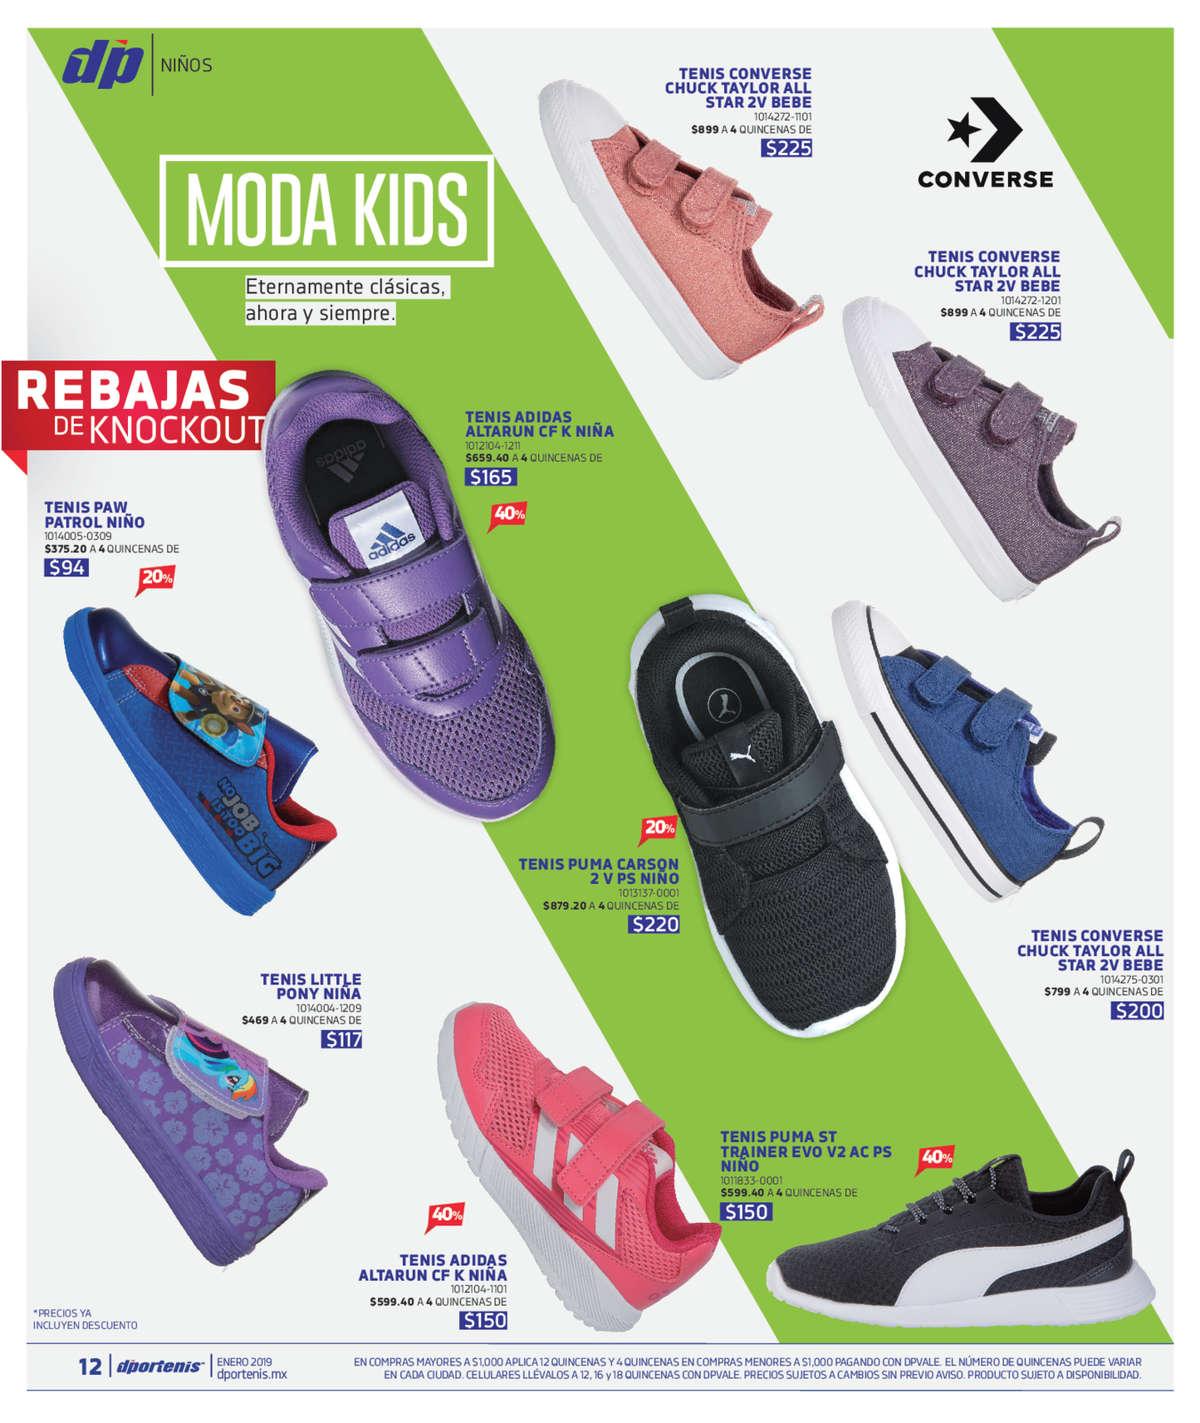 Dportenis calle morelos no centro guadalajara ofertas horarios ofertia jpg  1200x1423 Dportenis guadalajara mexico tennis d3b5163e4fa38